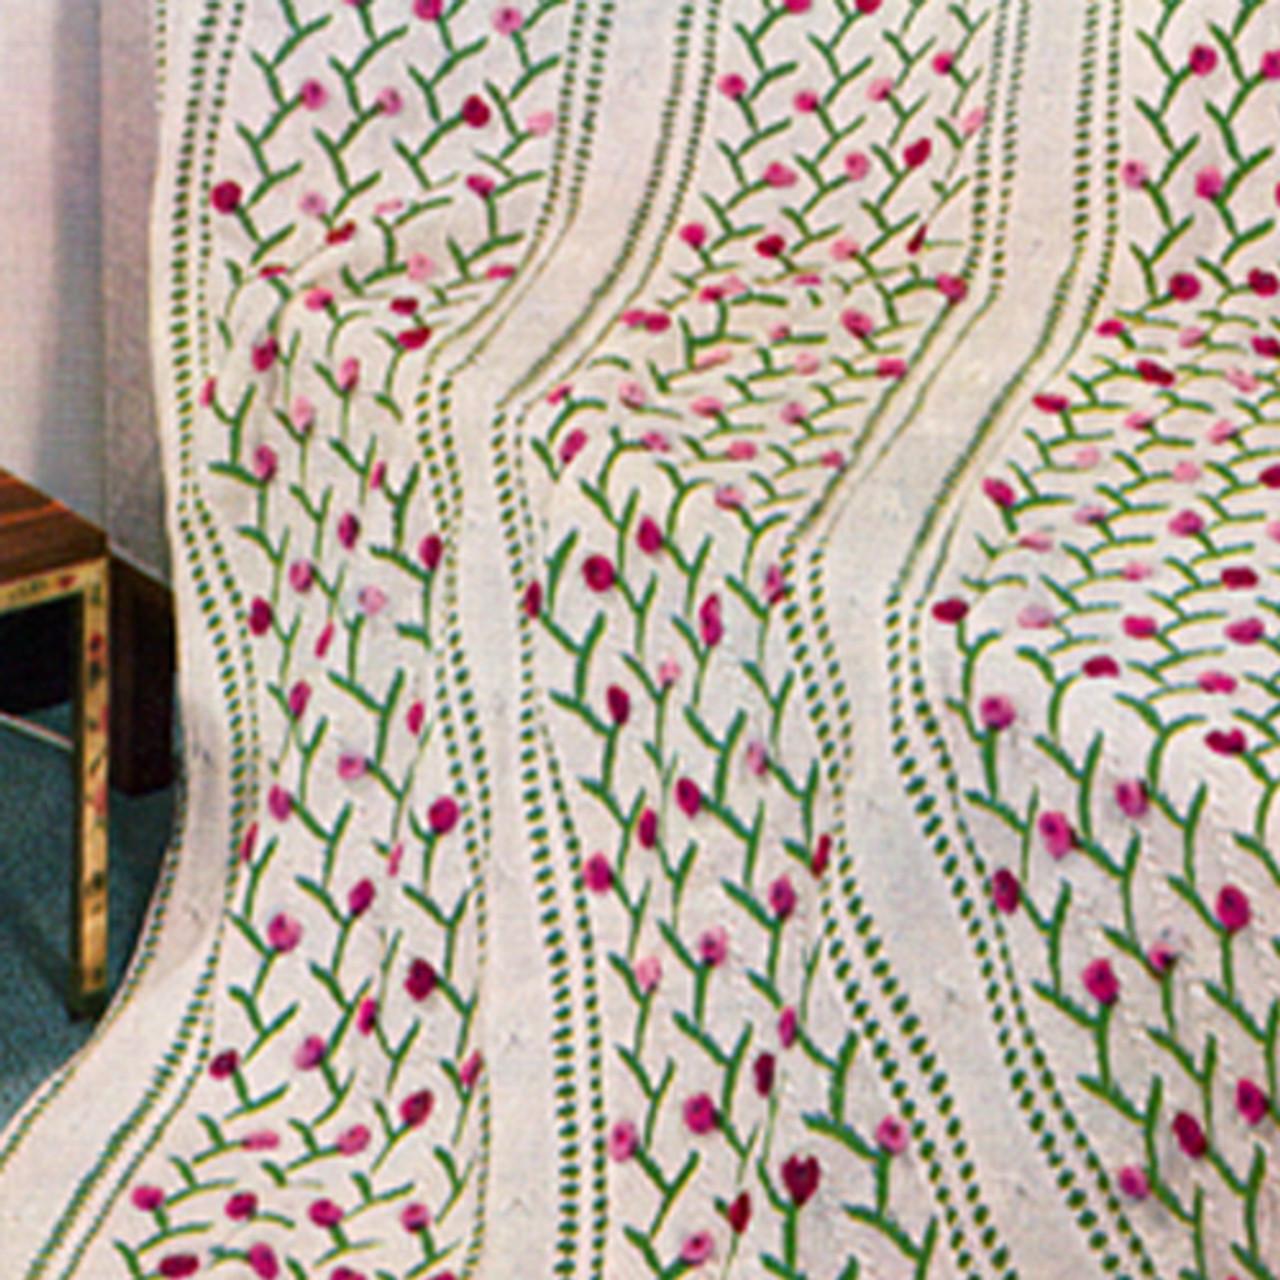 Vintage Knitted Rosebud Afghan Pattern from Bernhard